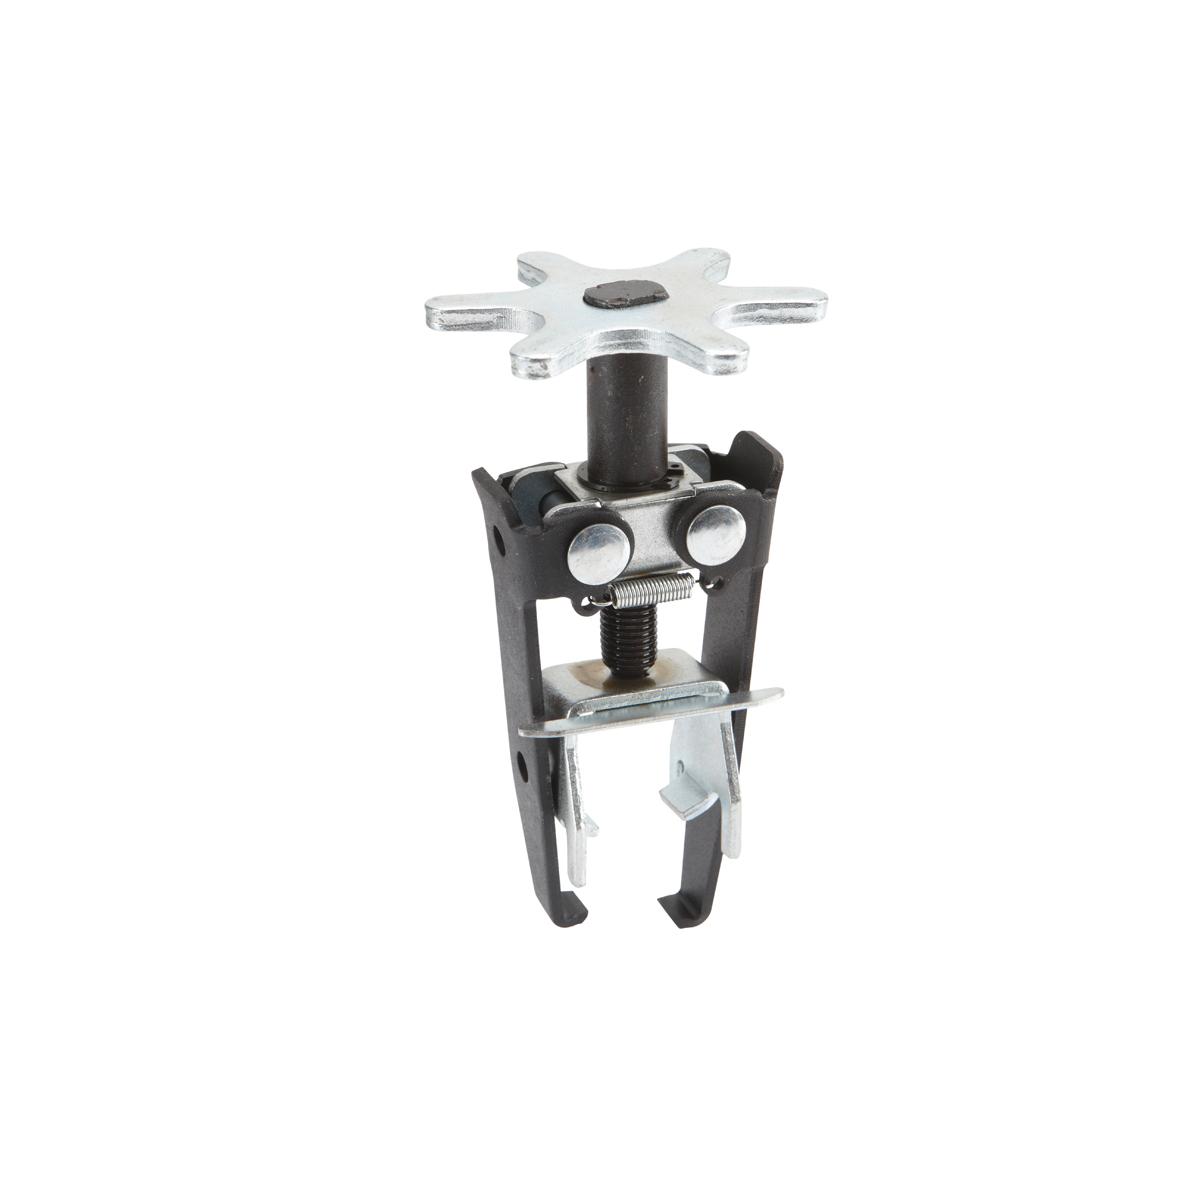 PITTSBURGH AUTOMOTIVE Universal Overhead Valve Spring Compressor - Item 60335 / 92900